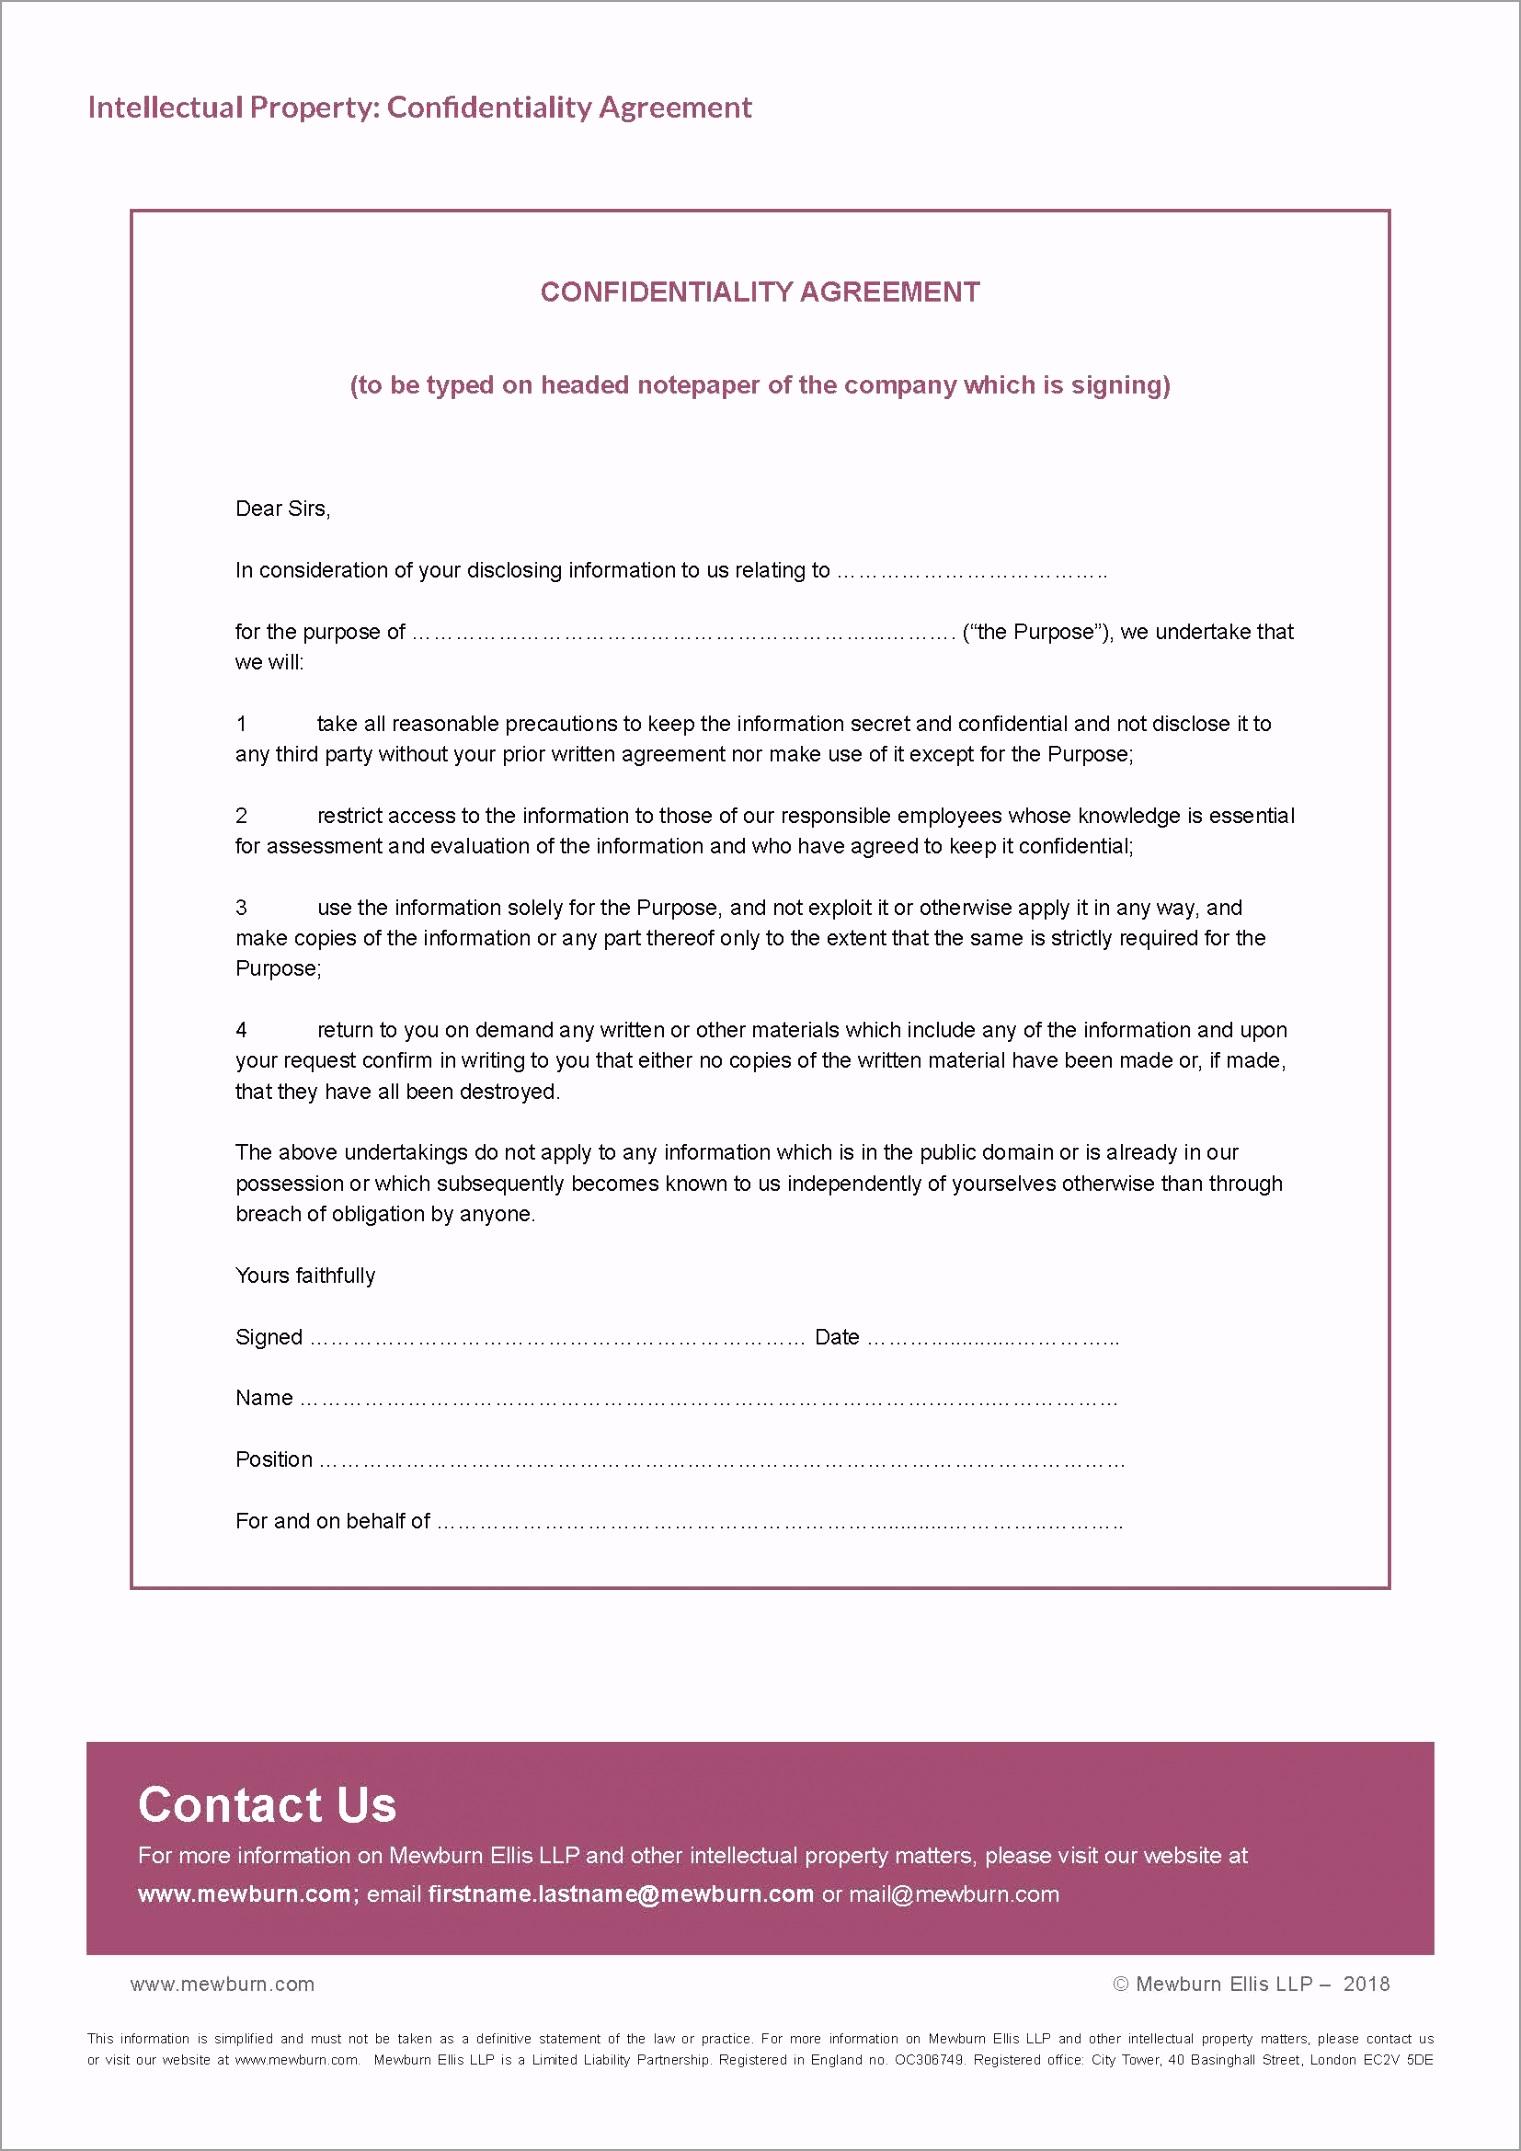 IP Confidentiality Agreement eytoy